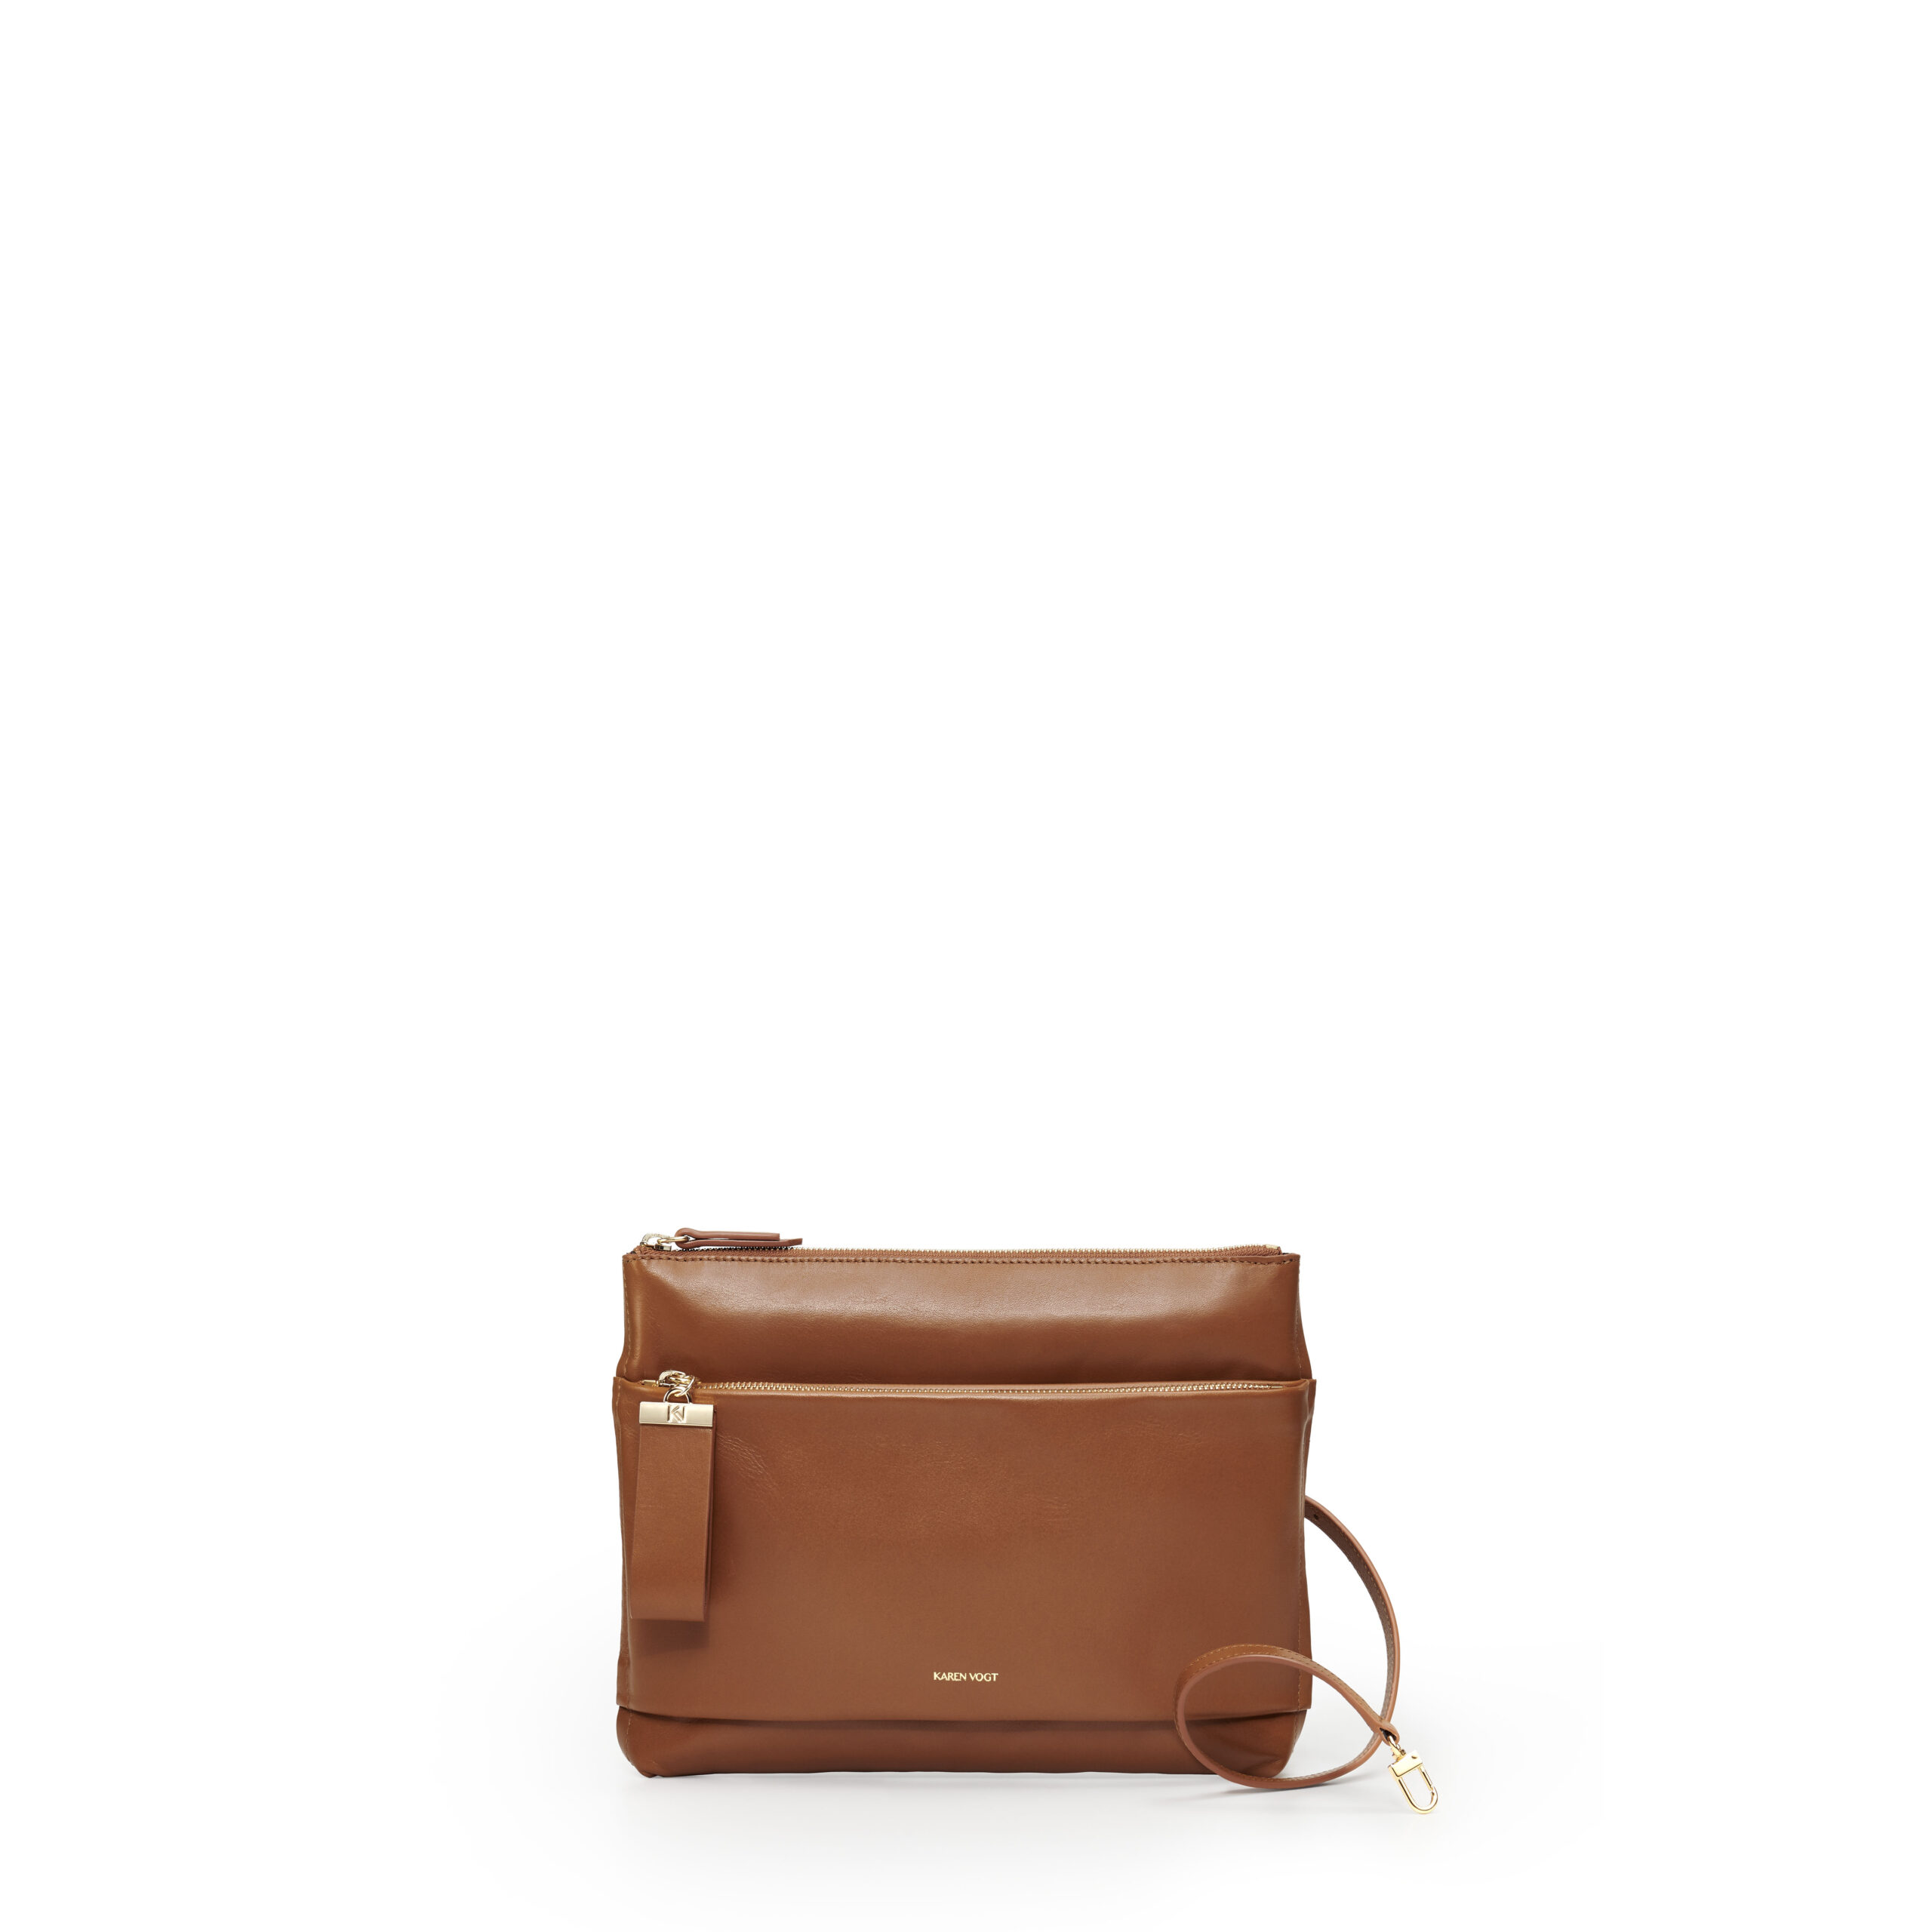 sac-pochette-bandoulière-cuir-lisse-tabac-espiègle-karenvogt-1